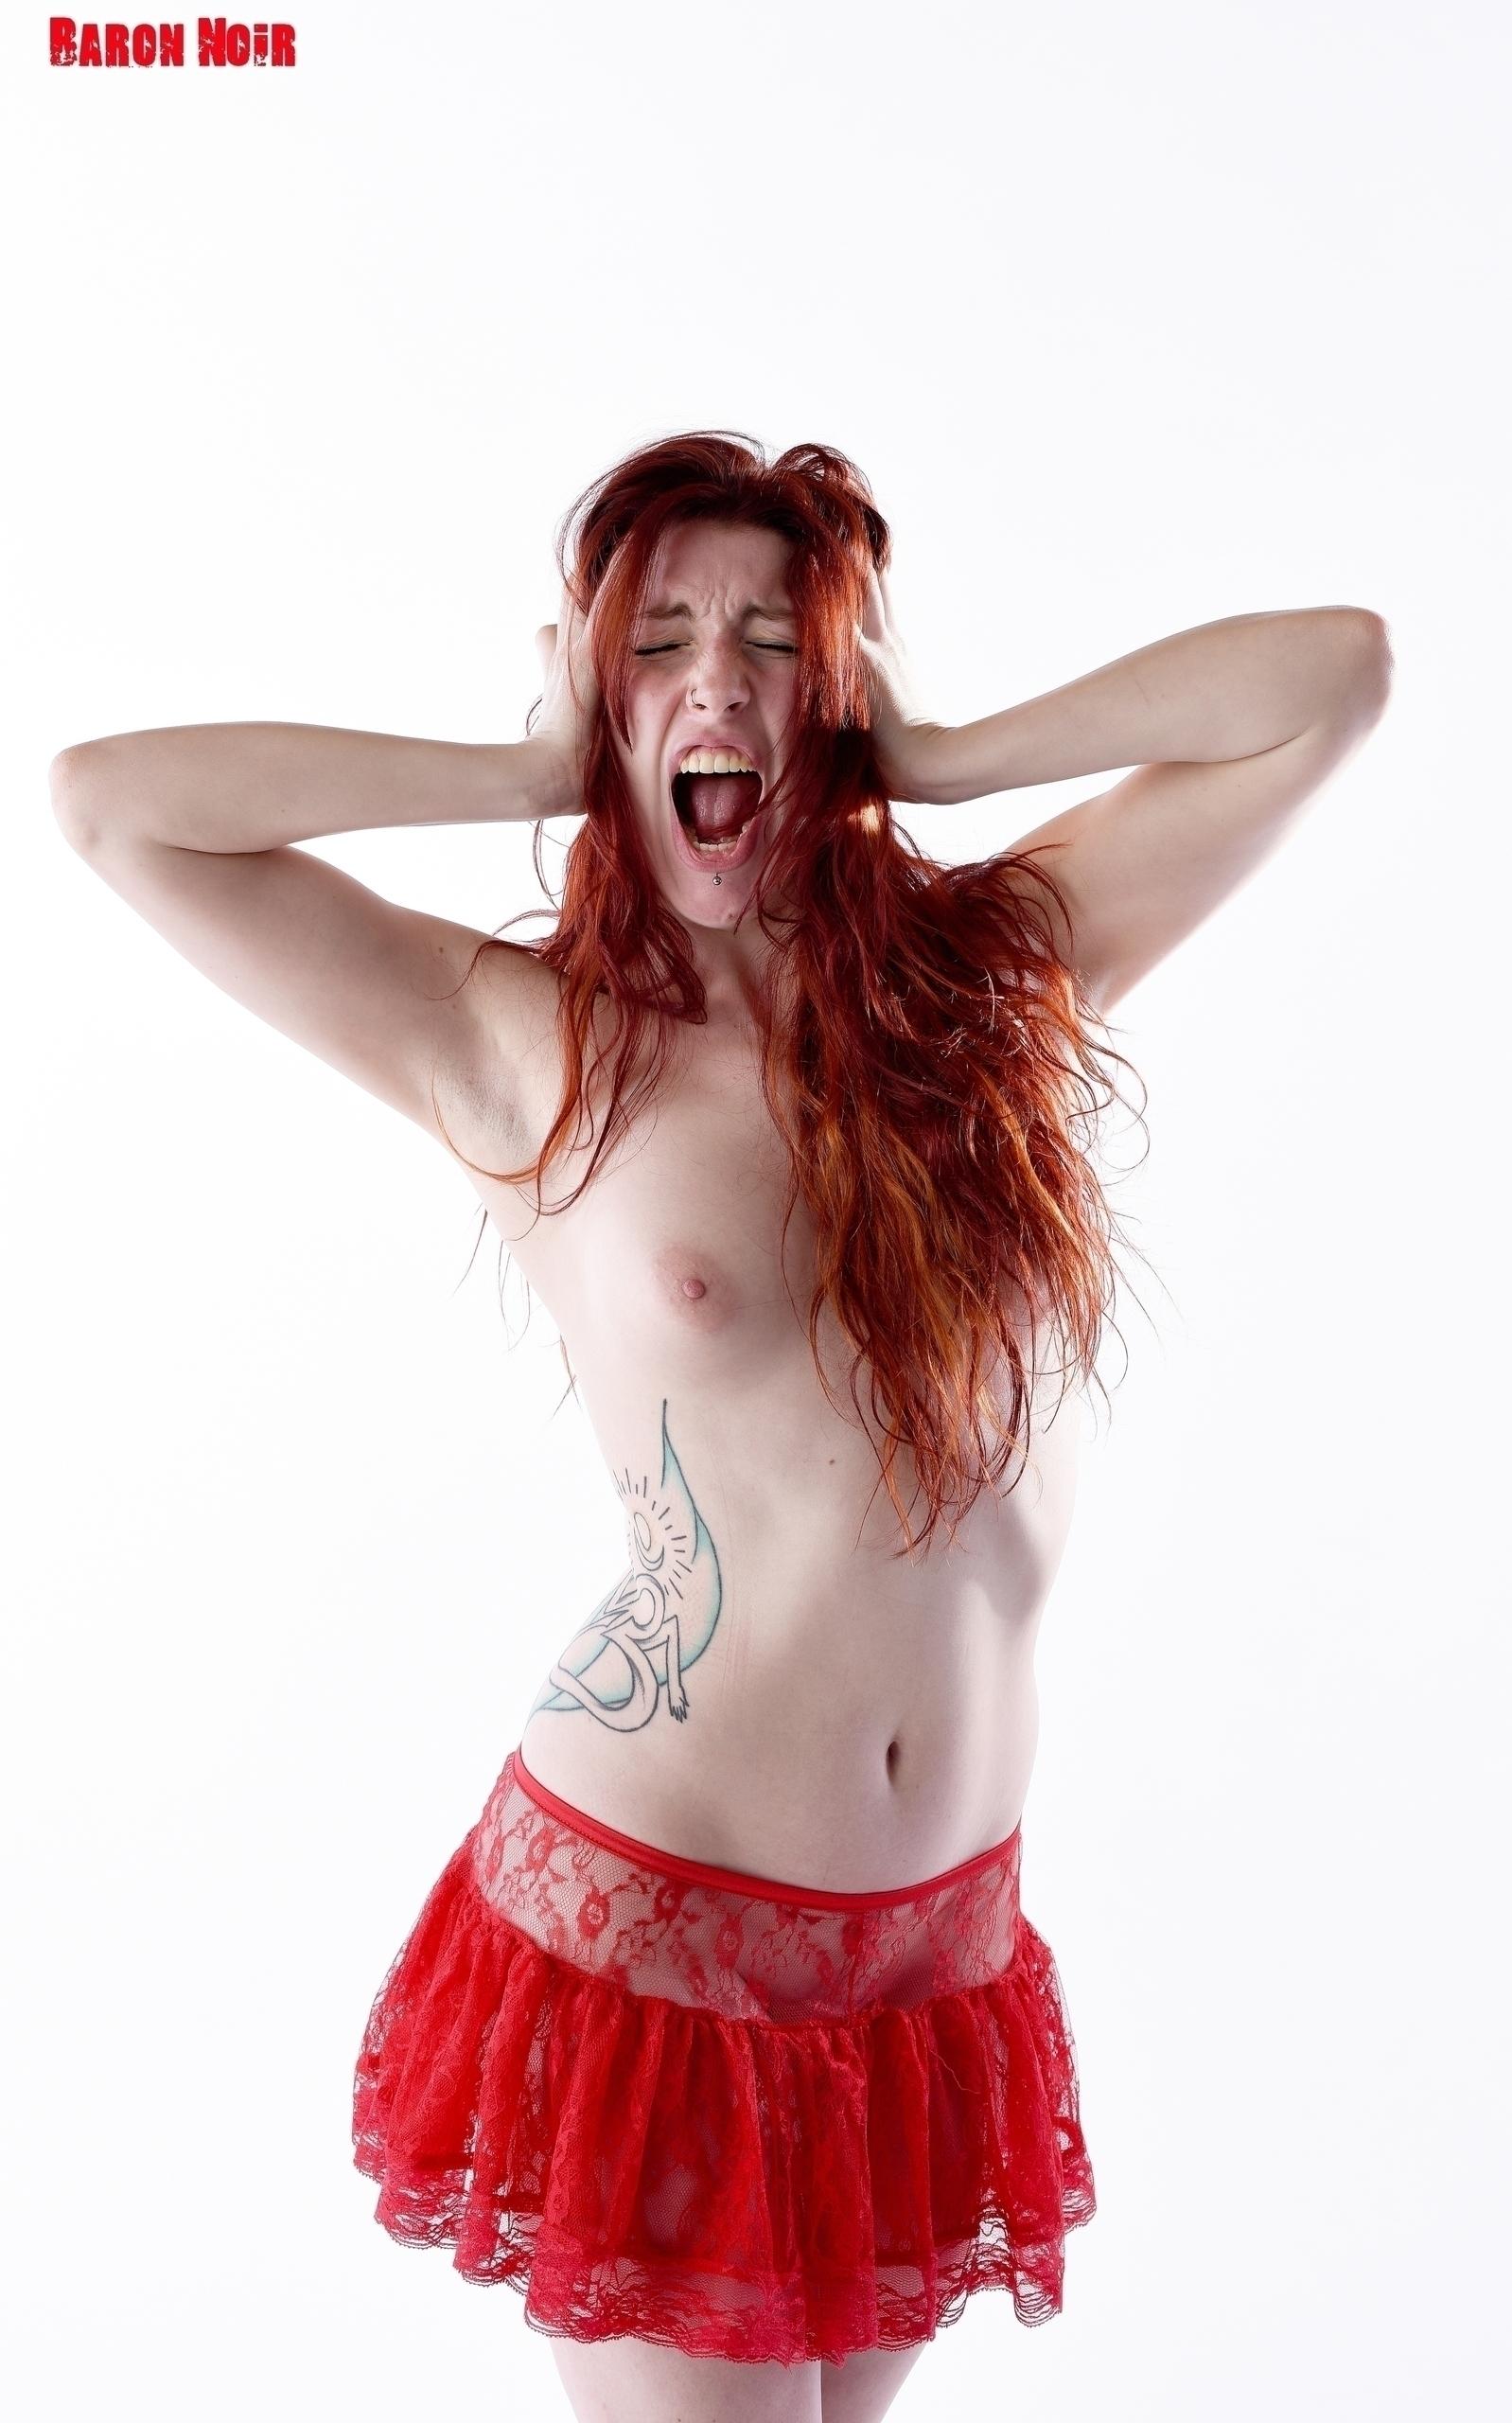 resist, Nude, NSFW, Hot, Sexy - baron-noir   ello